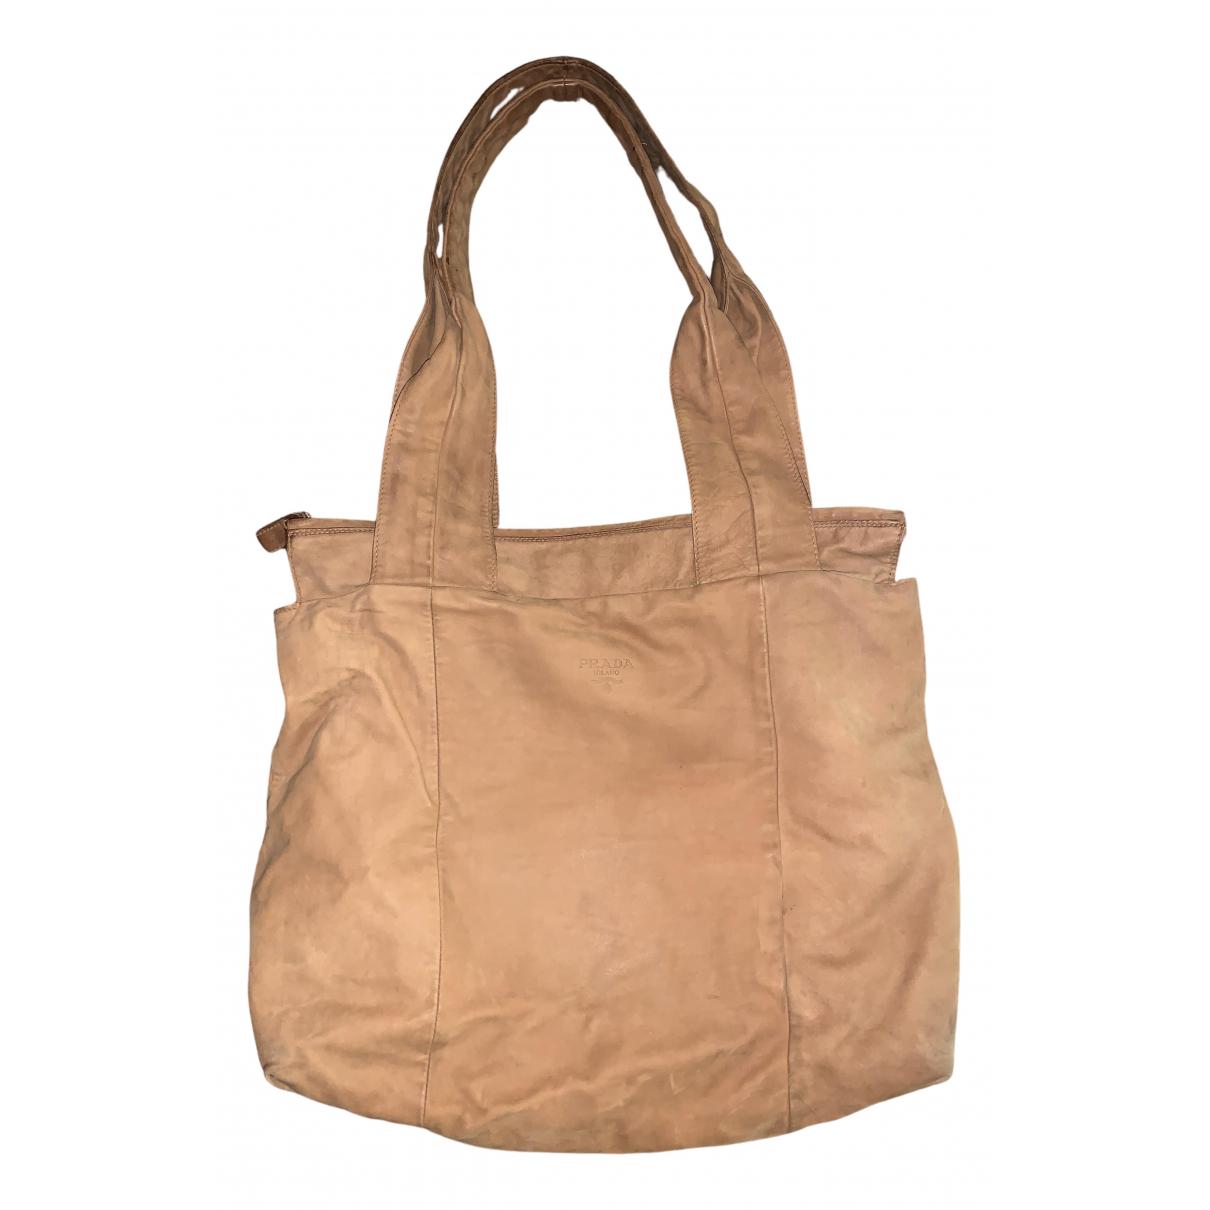 Prada \N Handtasche in  Kamel Veloursleder